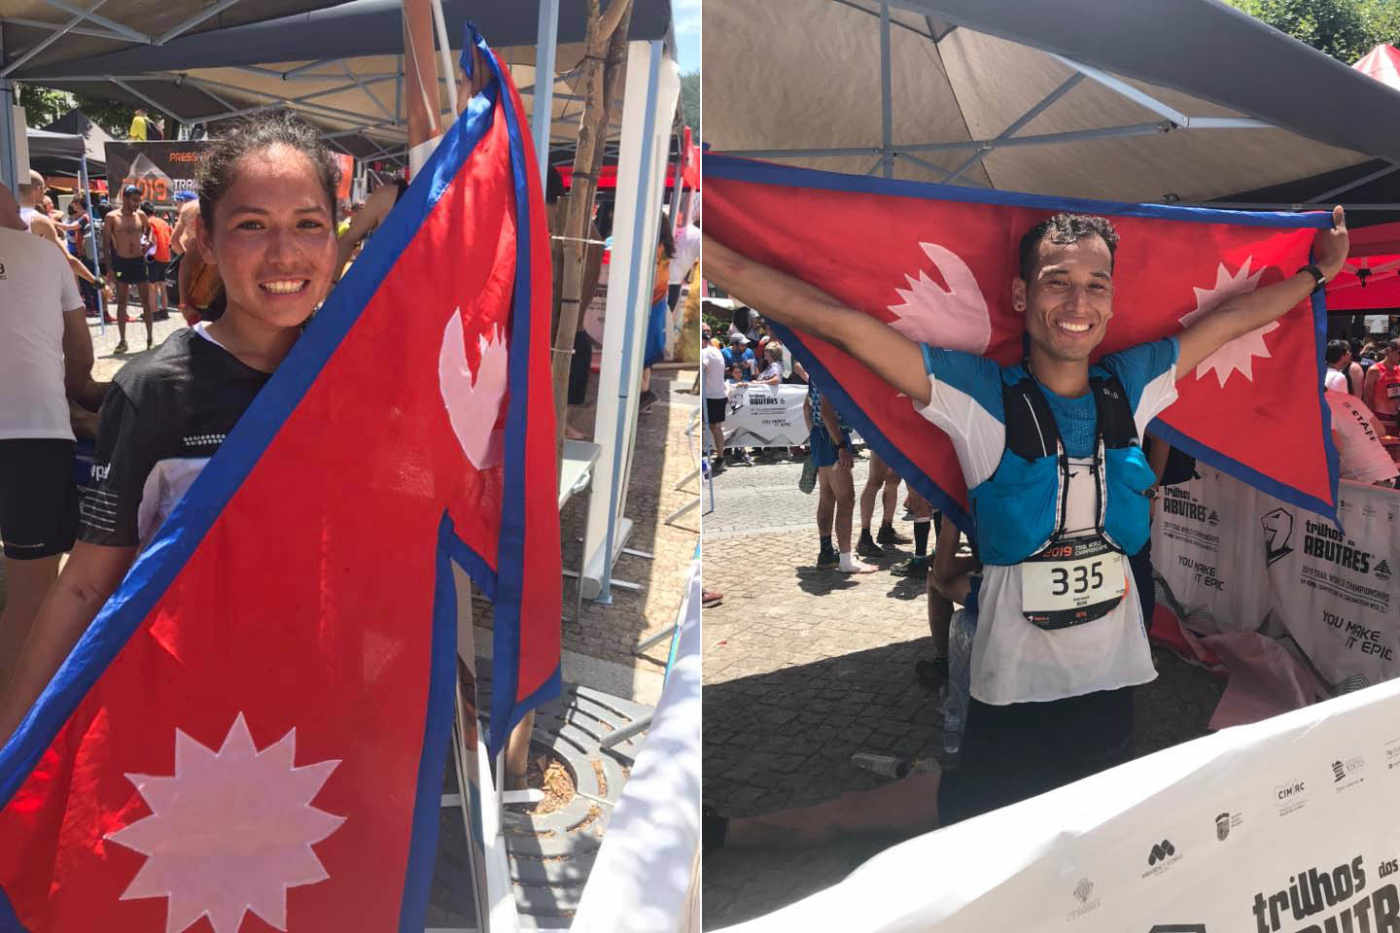 Sunmaya Budha Durga Budha nepali athletes with flag